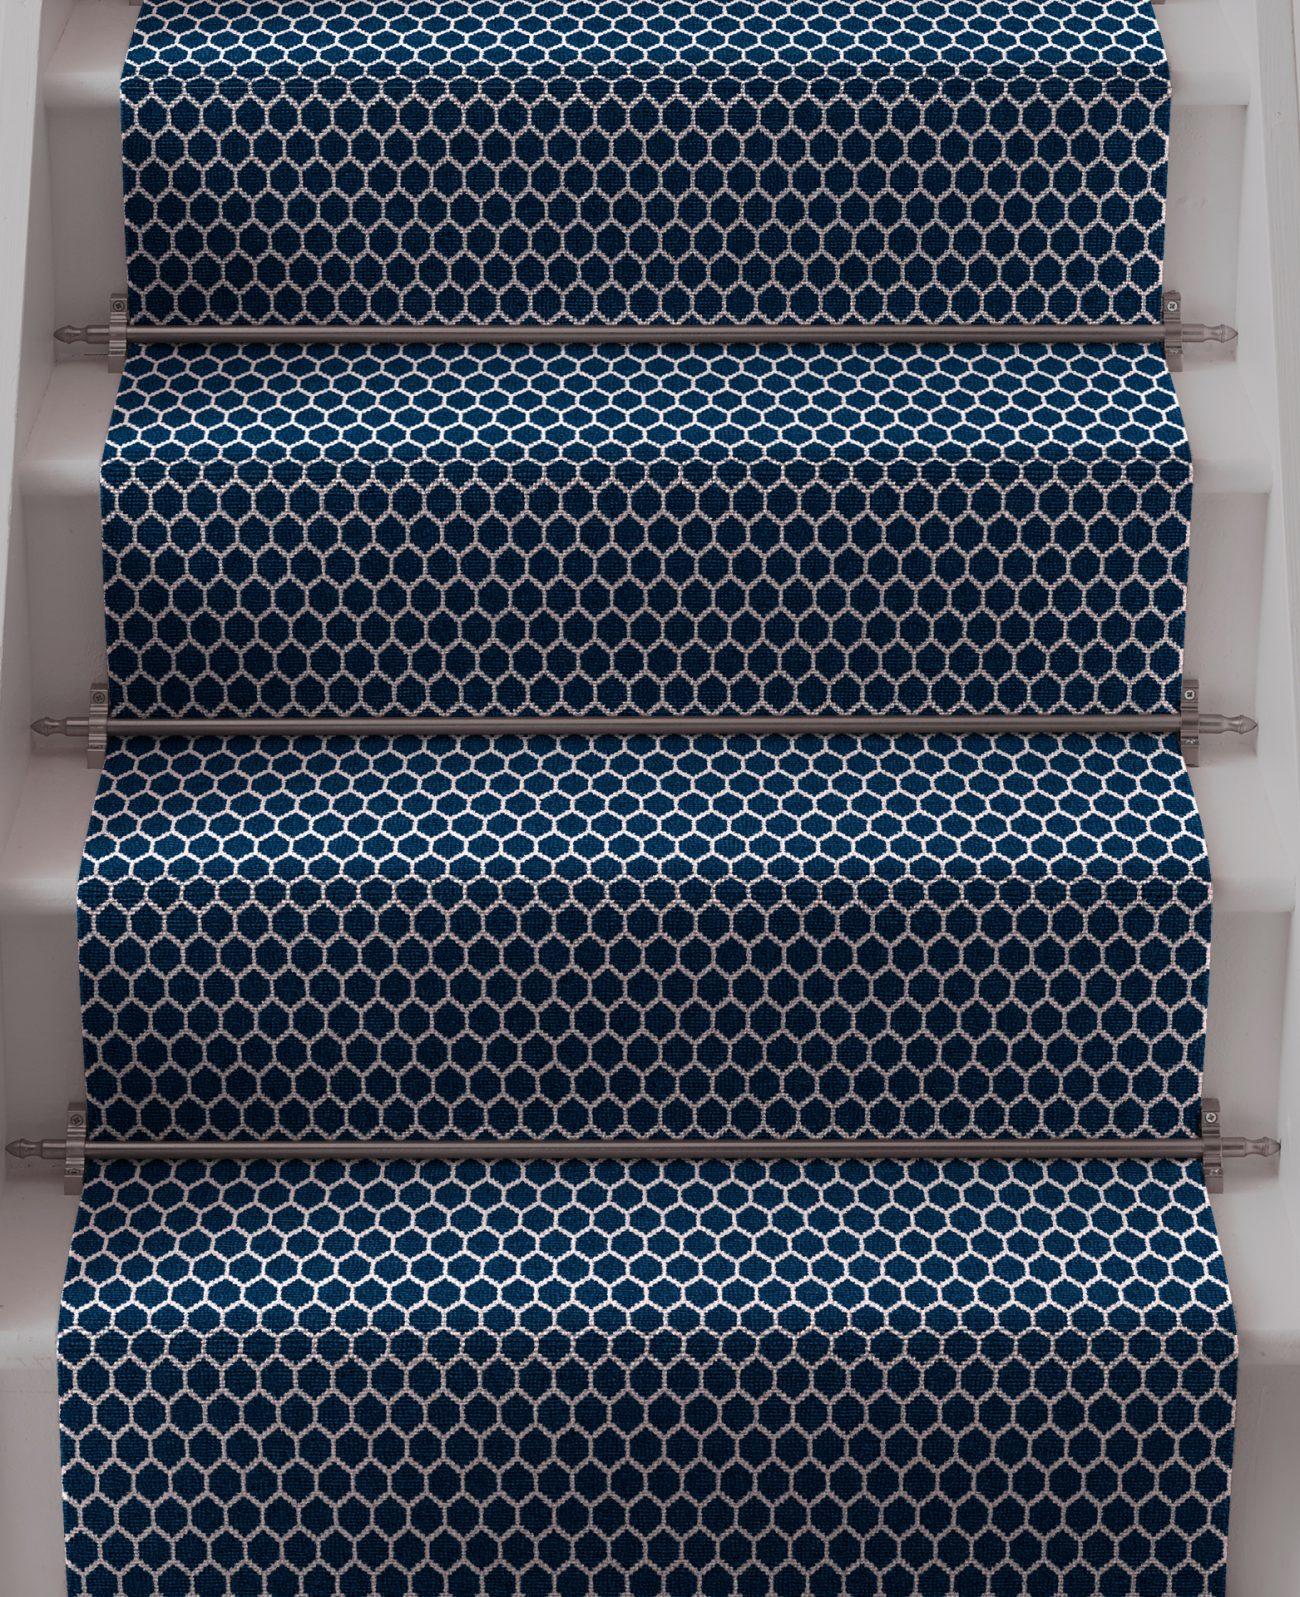 Chelsea Metropolitan Collection Marina Blue CHEL 030